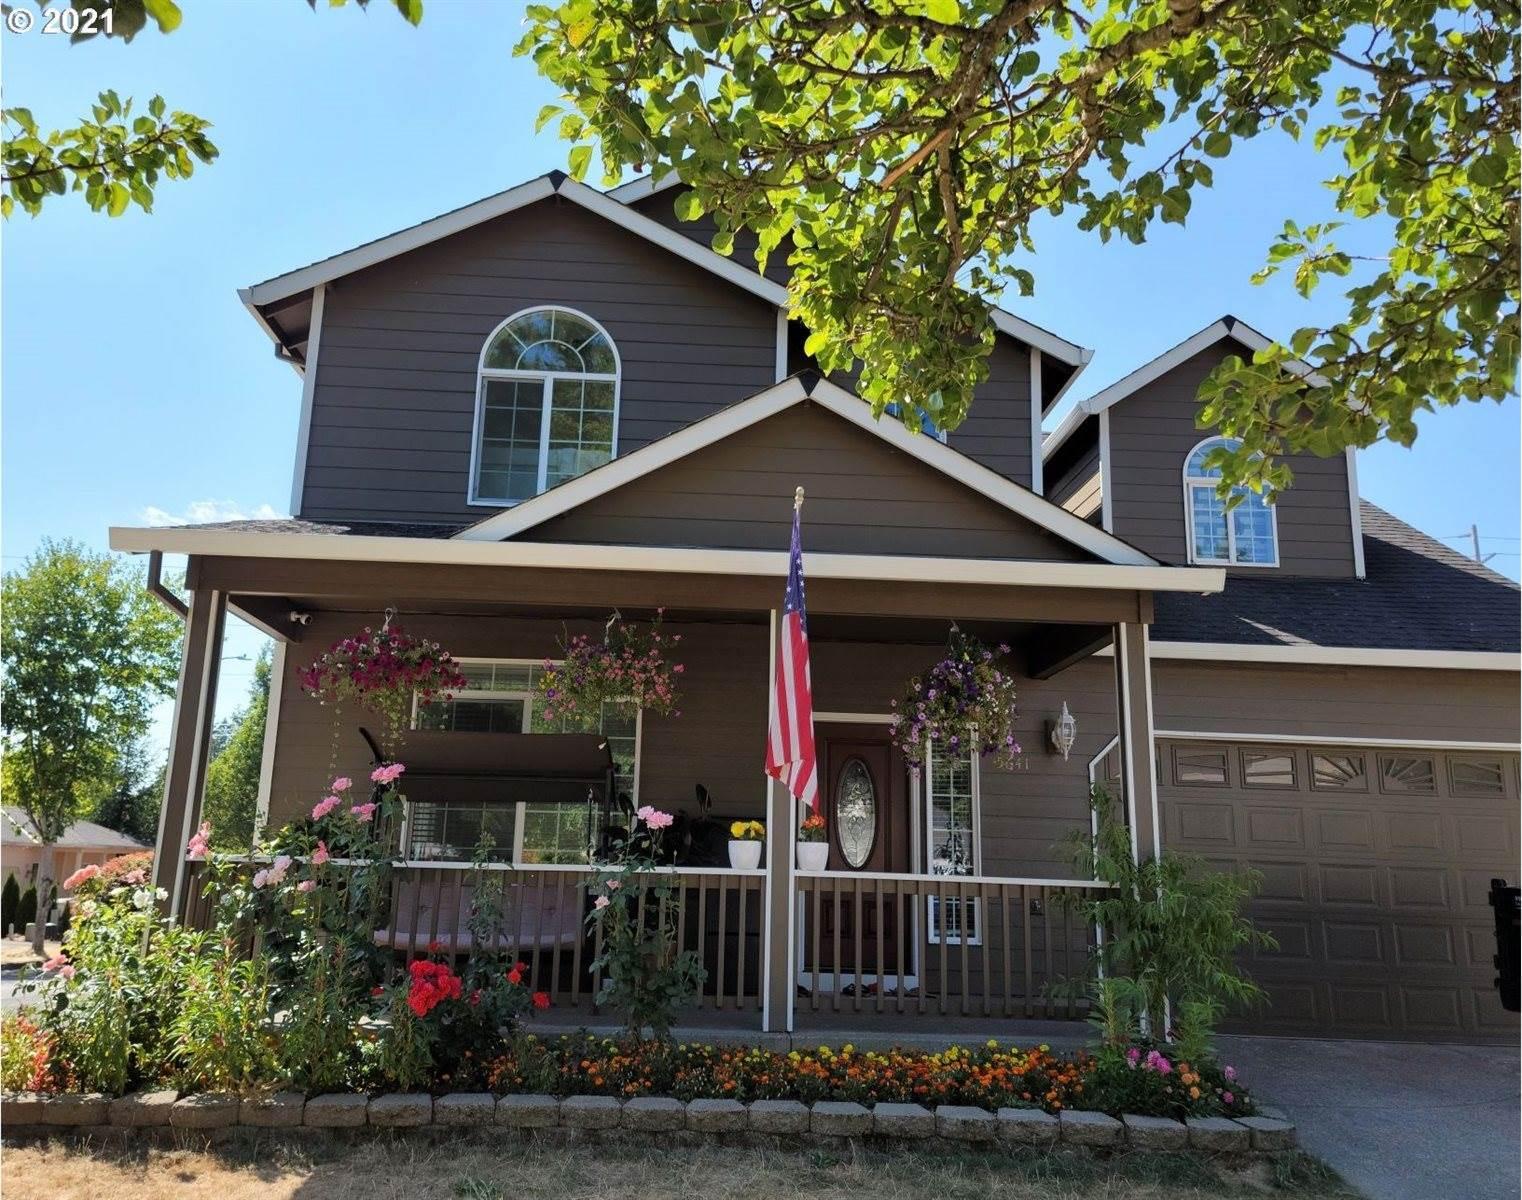 5641 SE 137TH Ave, Portland, OR 97236